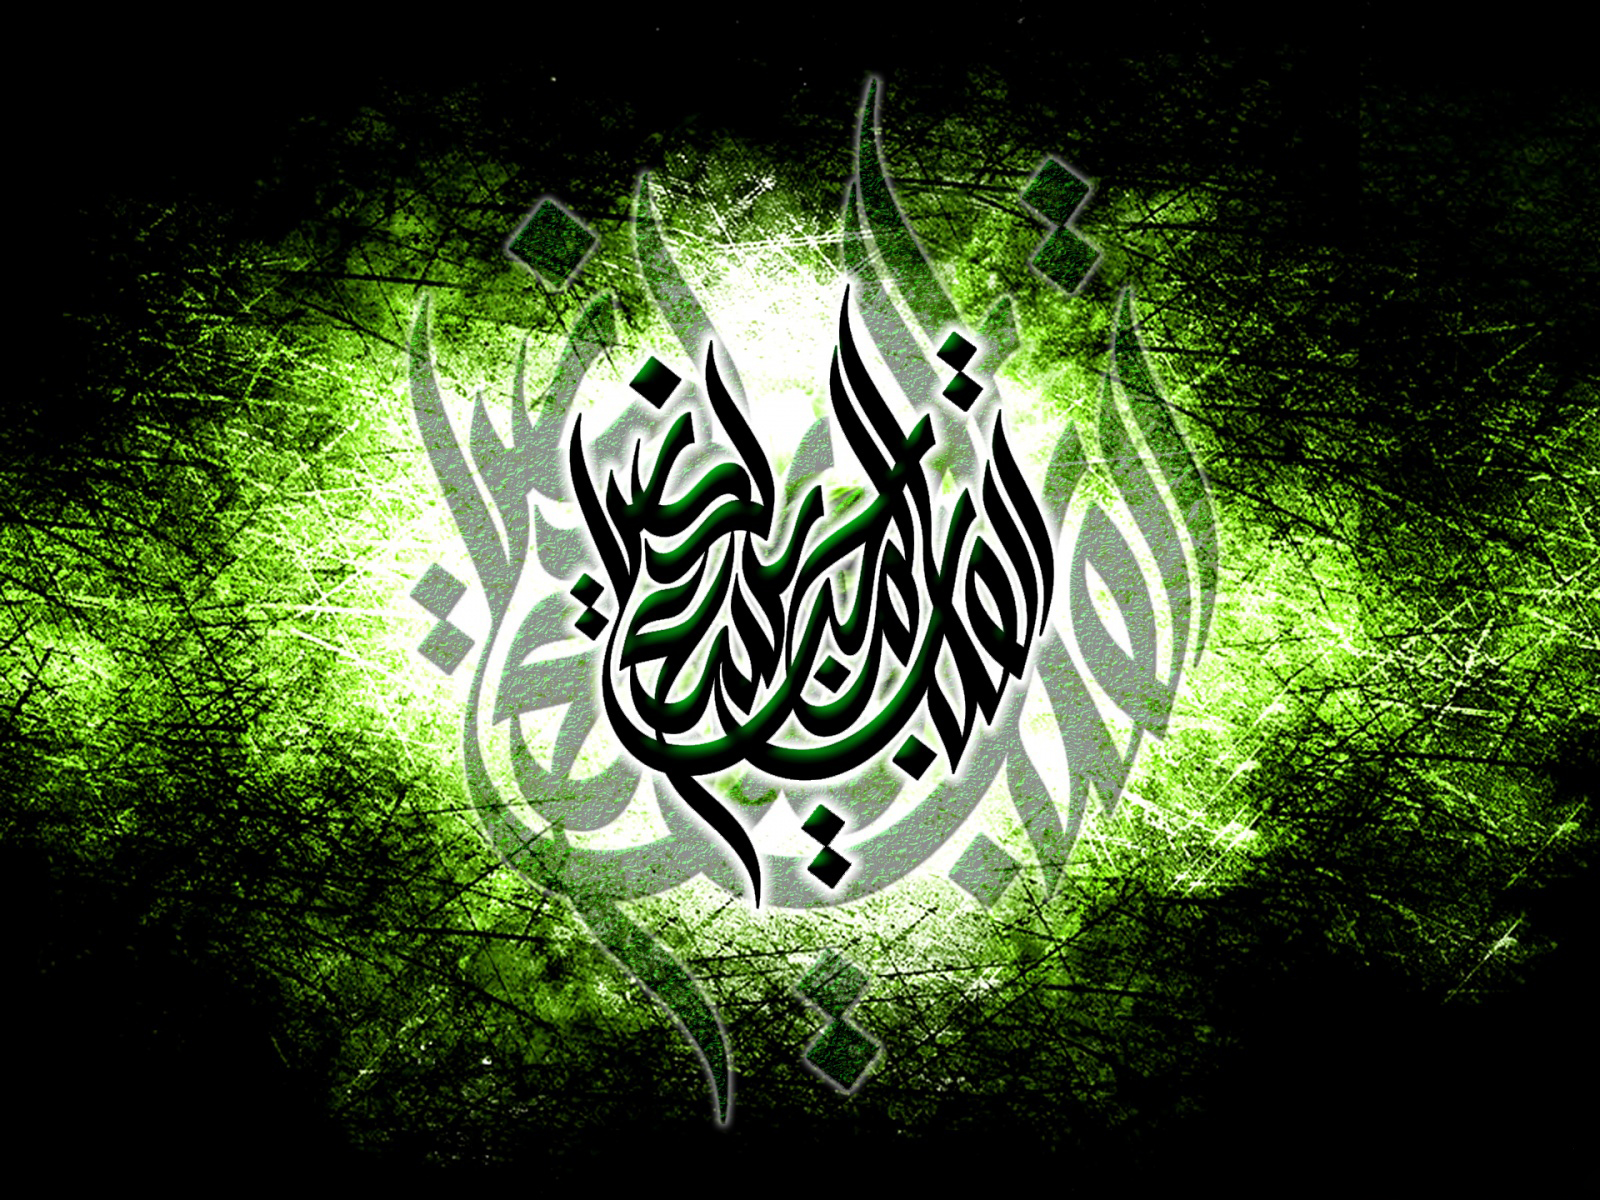 Kaligrafi Arab 594137 Hd Wallpaper Backgrounds Download